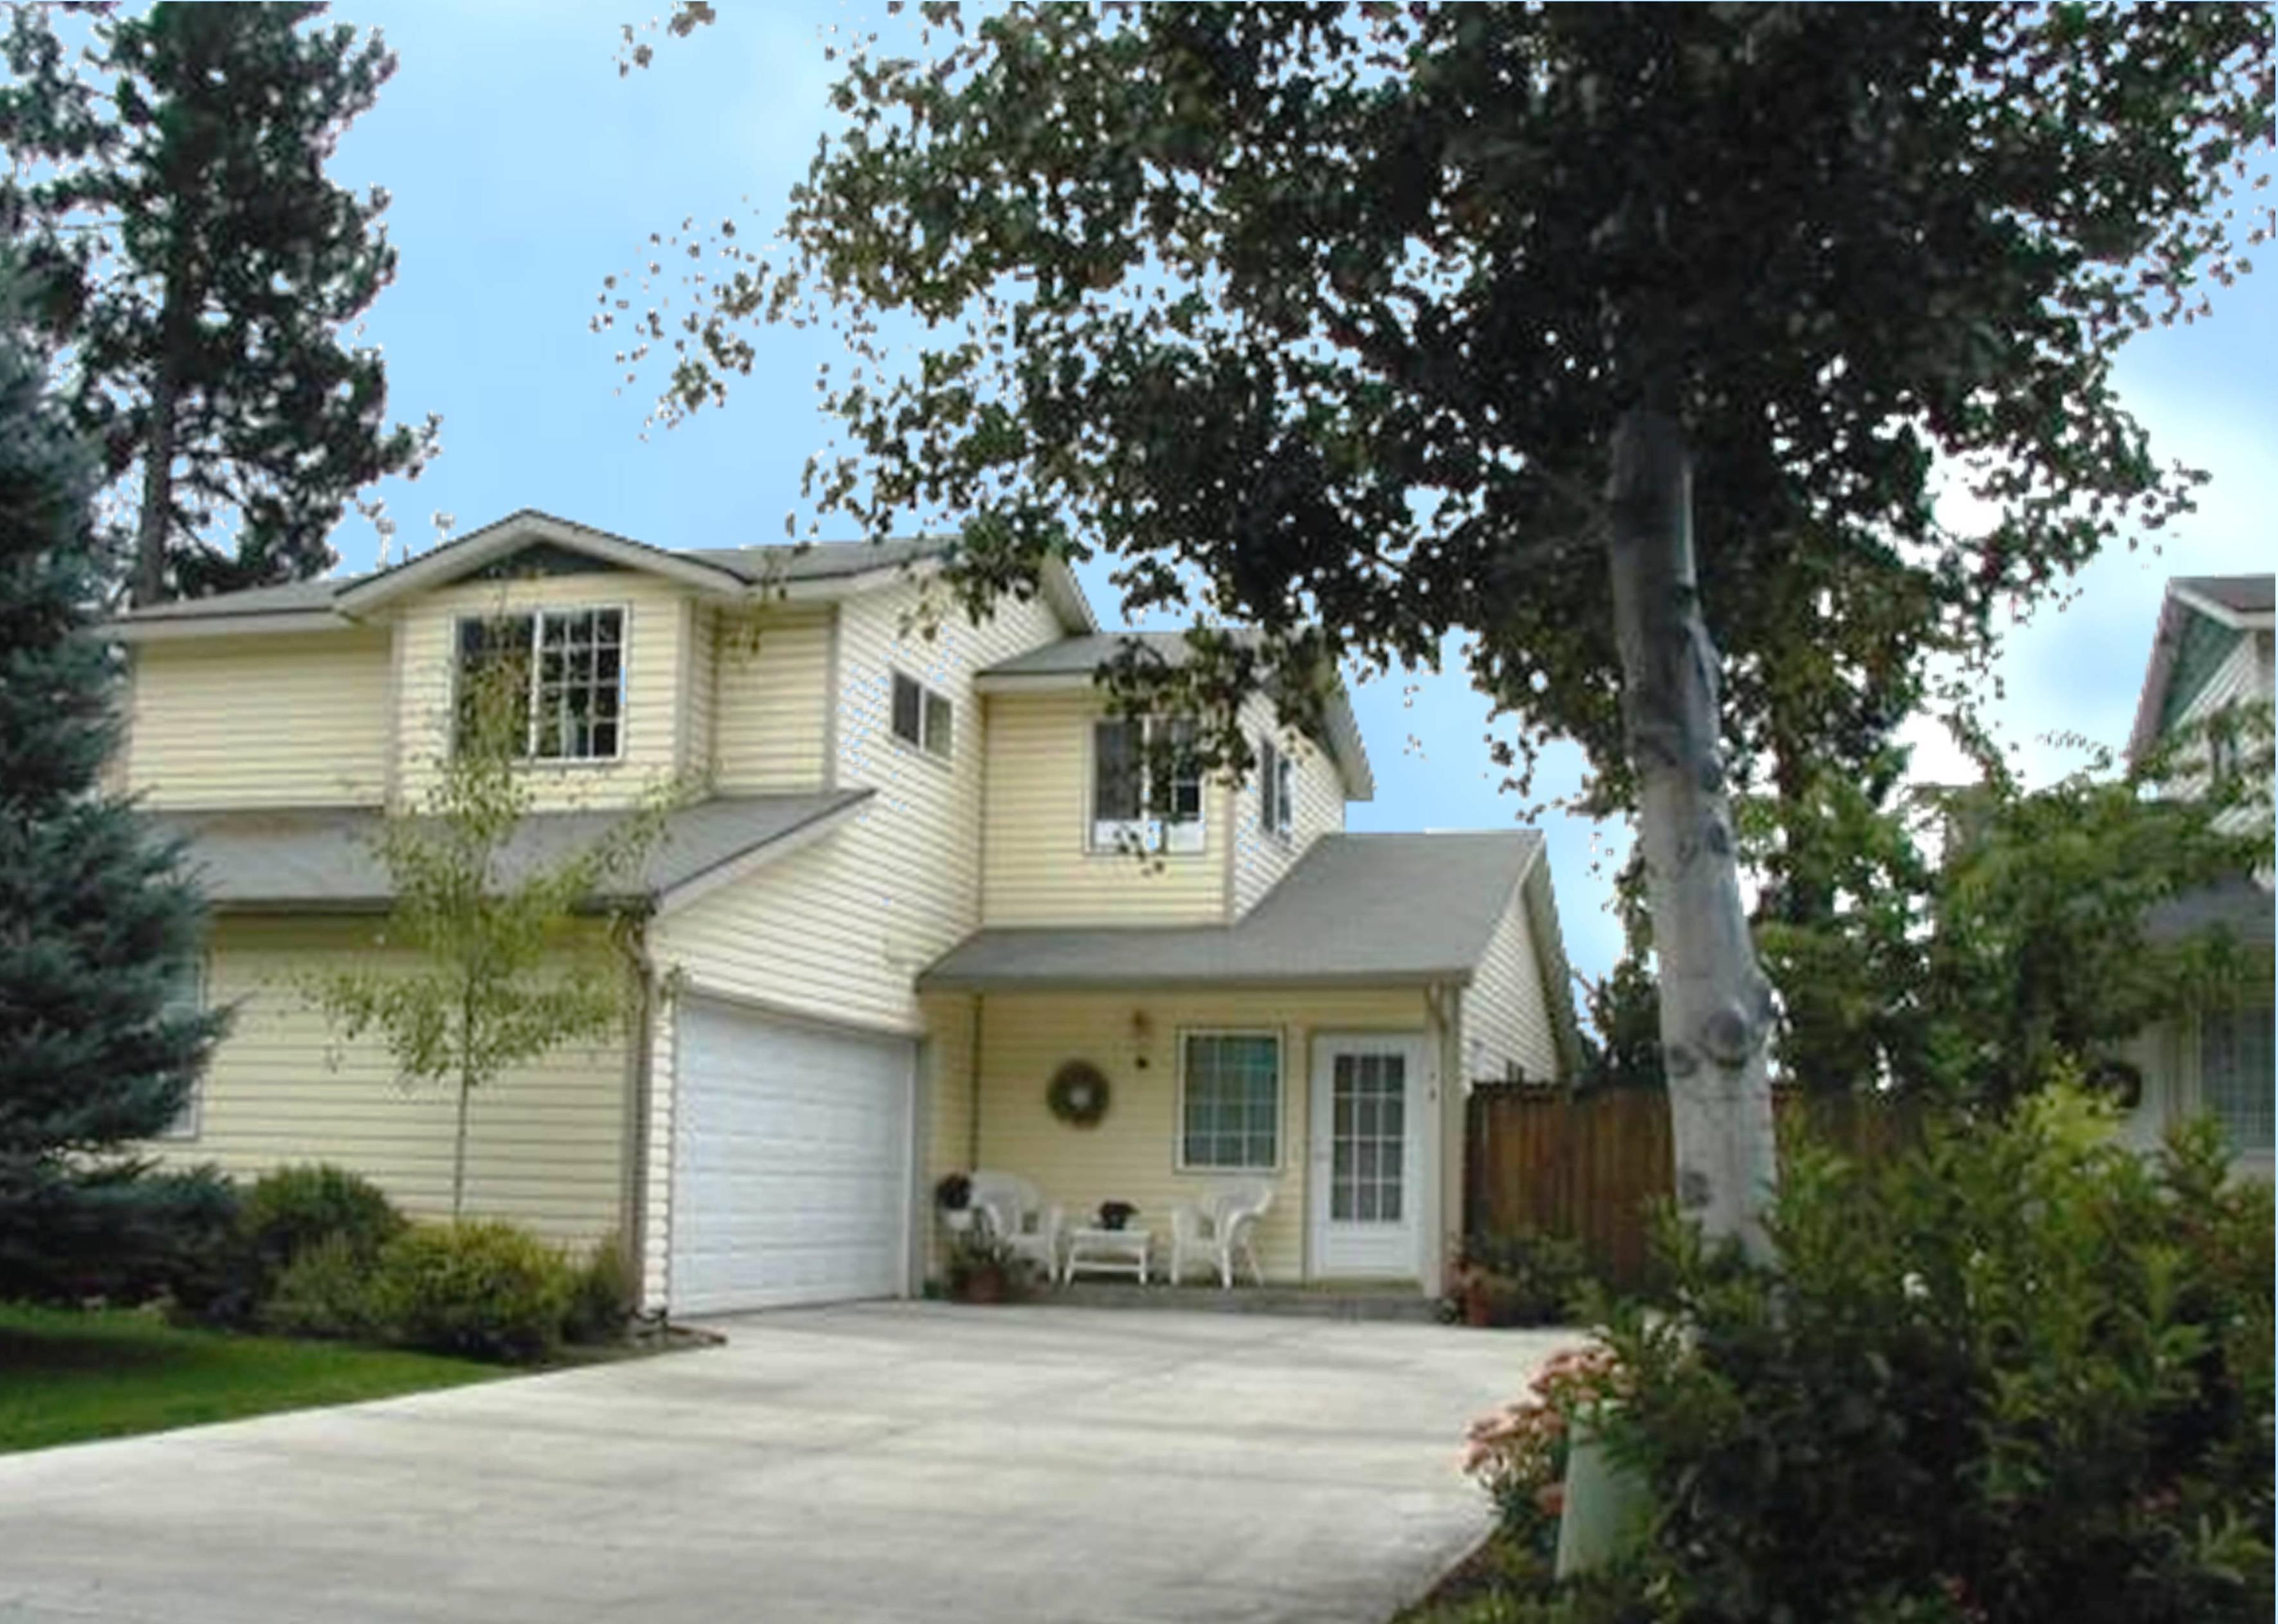 Open House This Saturday Village Condos Randy Christy Oetken Coeur D 39 Alene Real Estate